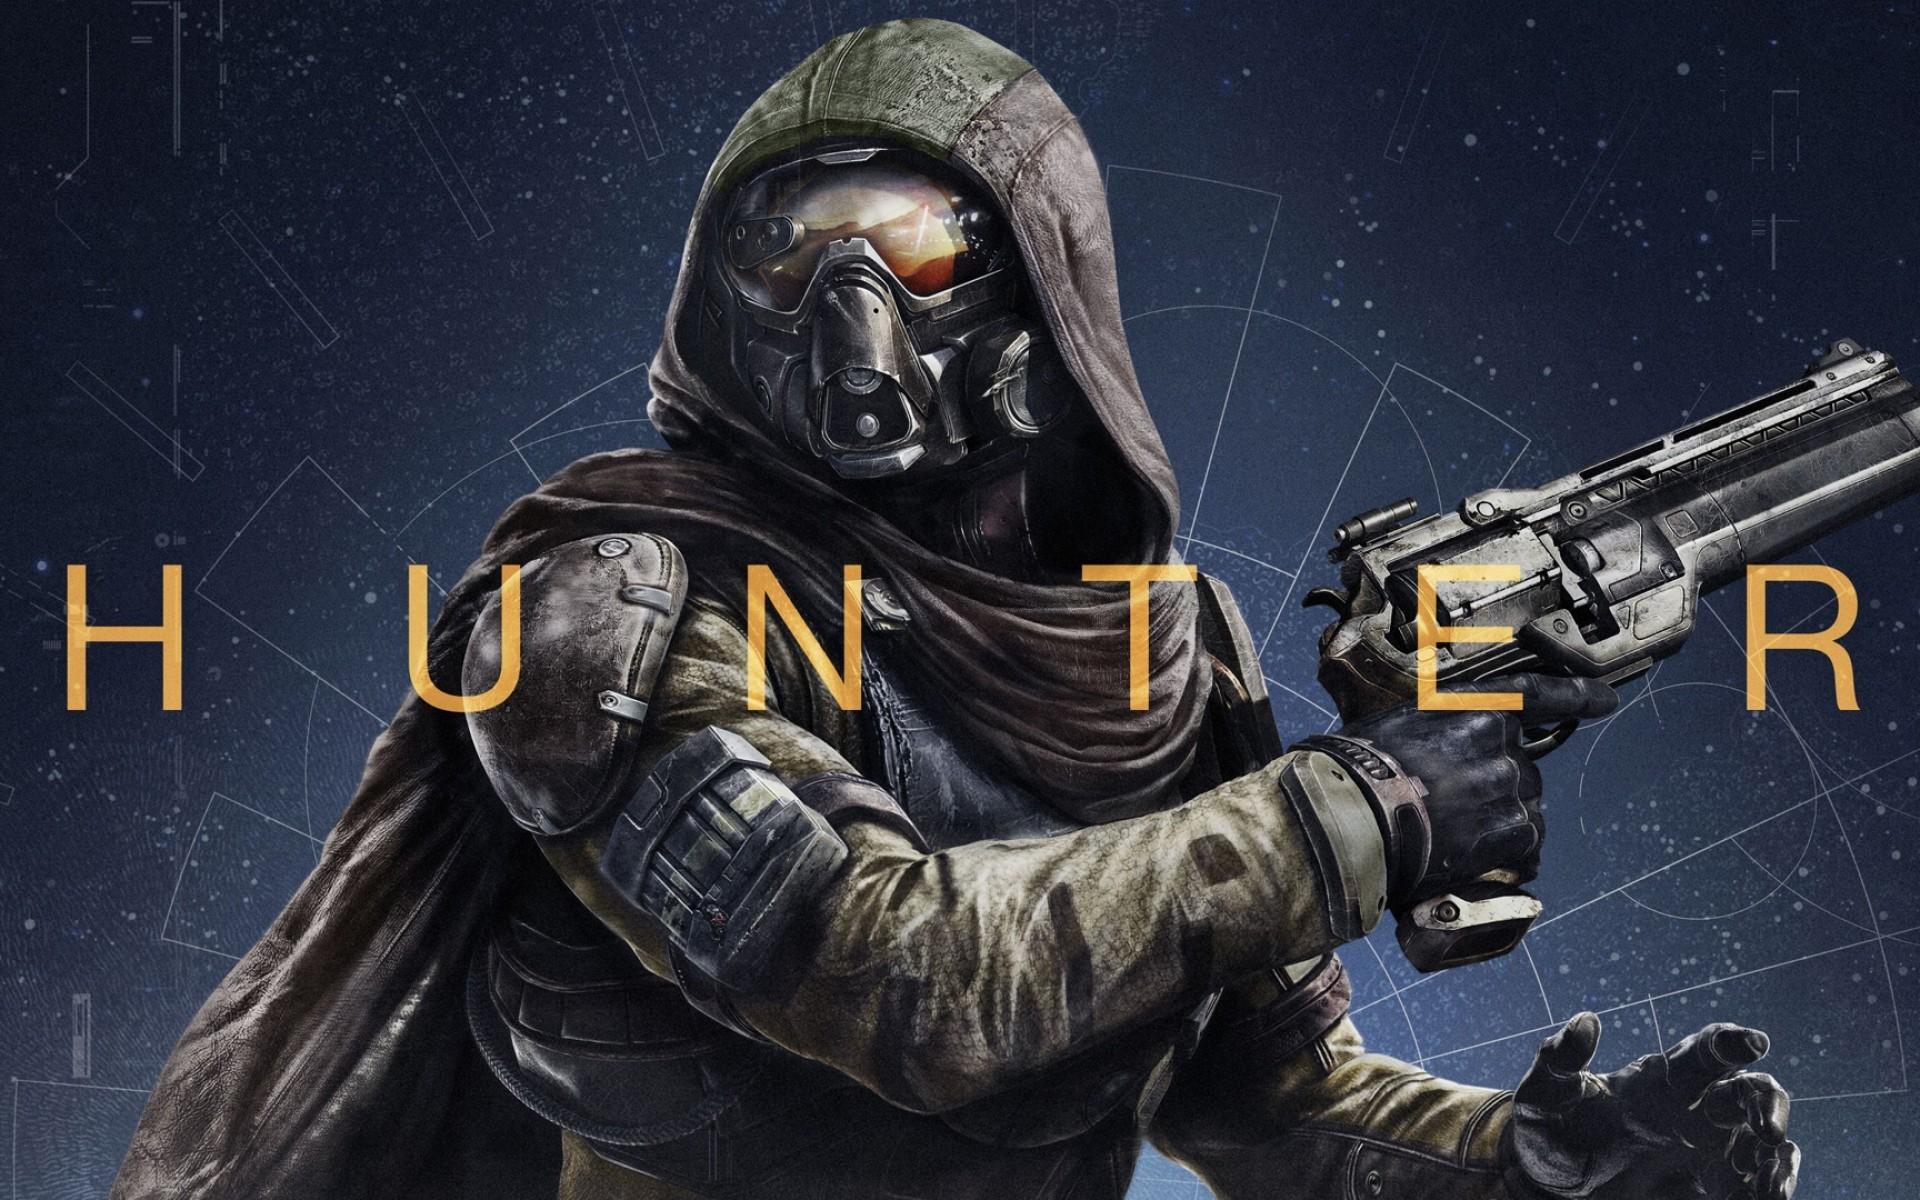 destiny hunter wallpaper. Â«Â«